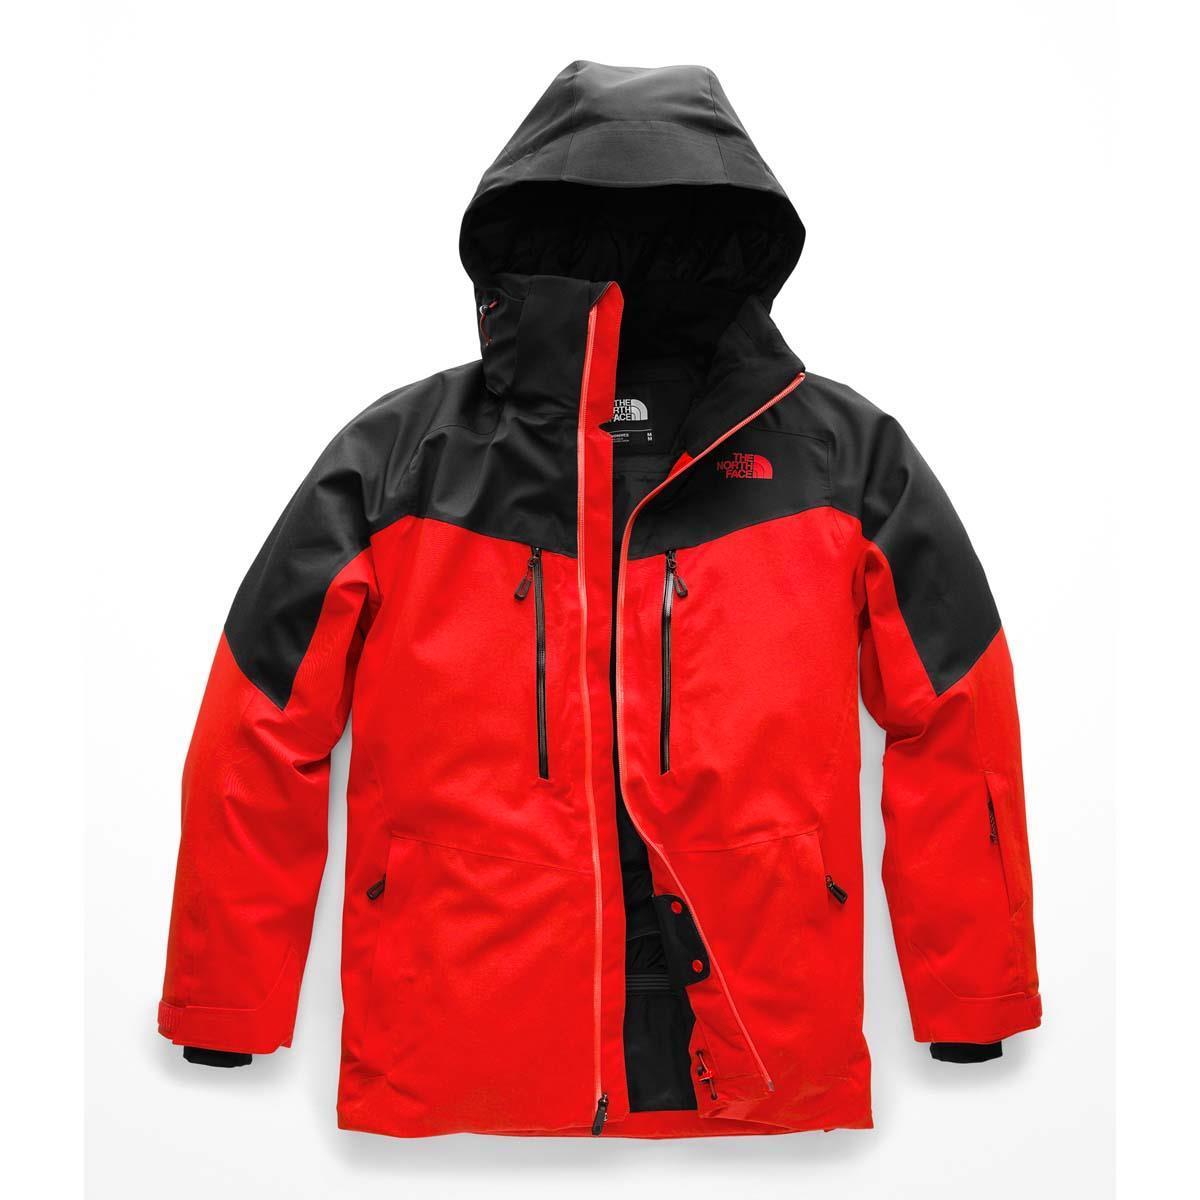 940ea3b66 The North Face Chakal Jacket - Men's